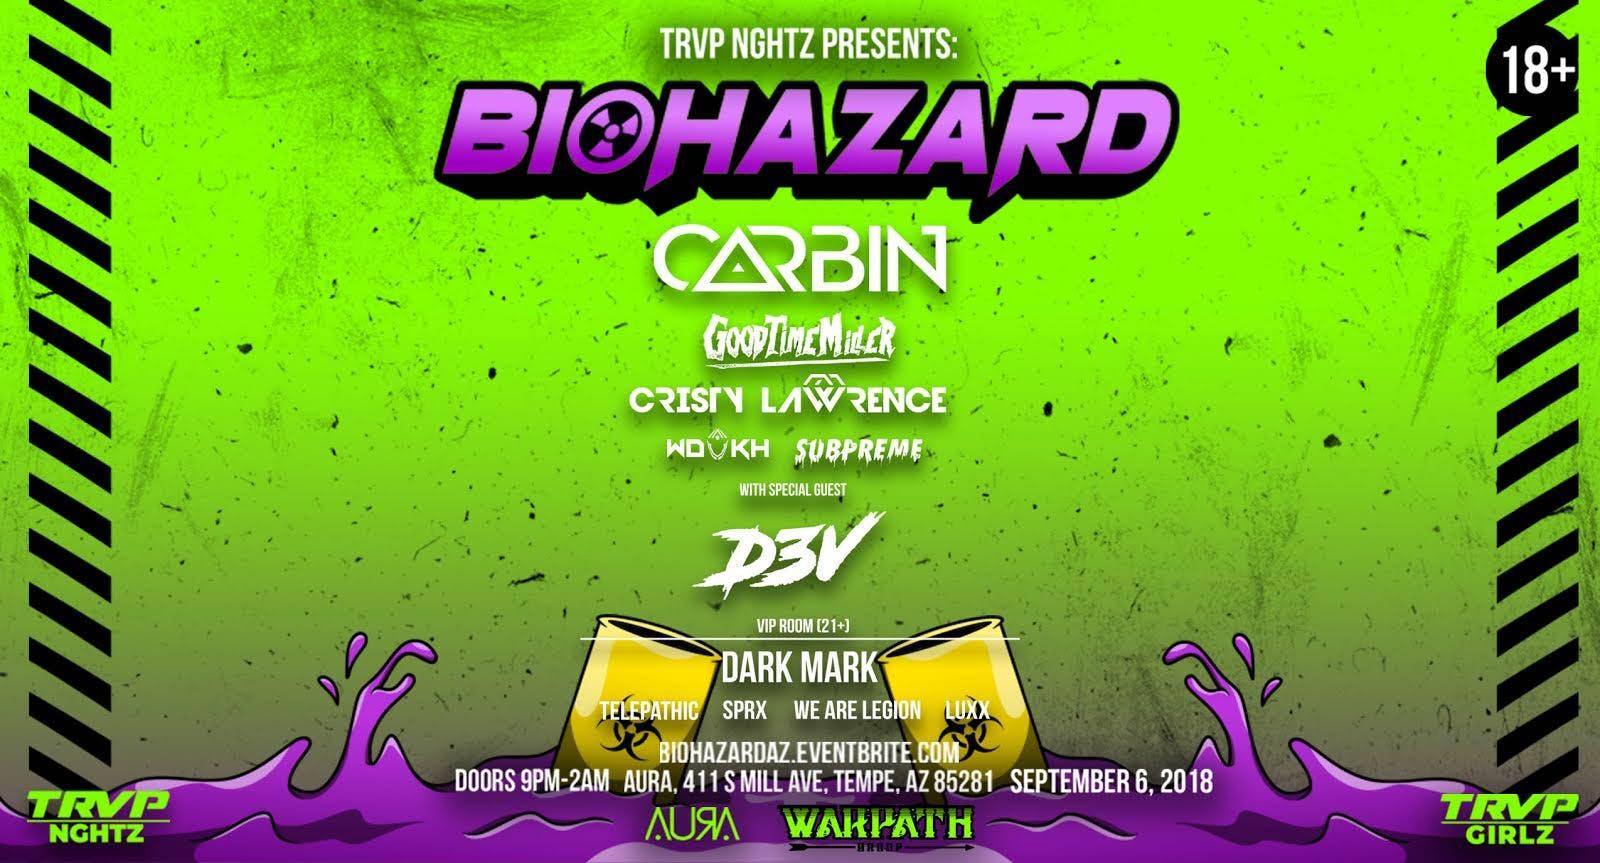 TRVP NGHTZ Presents CARBIN, D3V, CRISTY LAWRENCE & MORE! @ Aura Nightclub